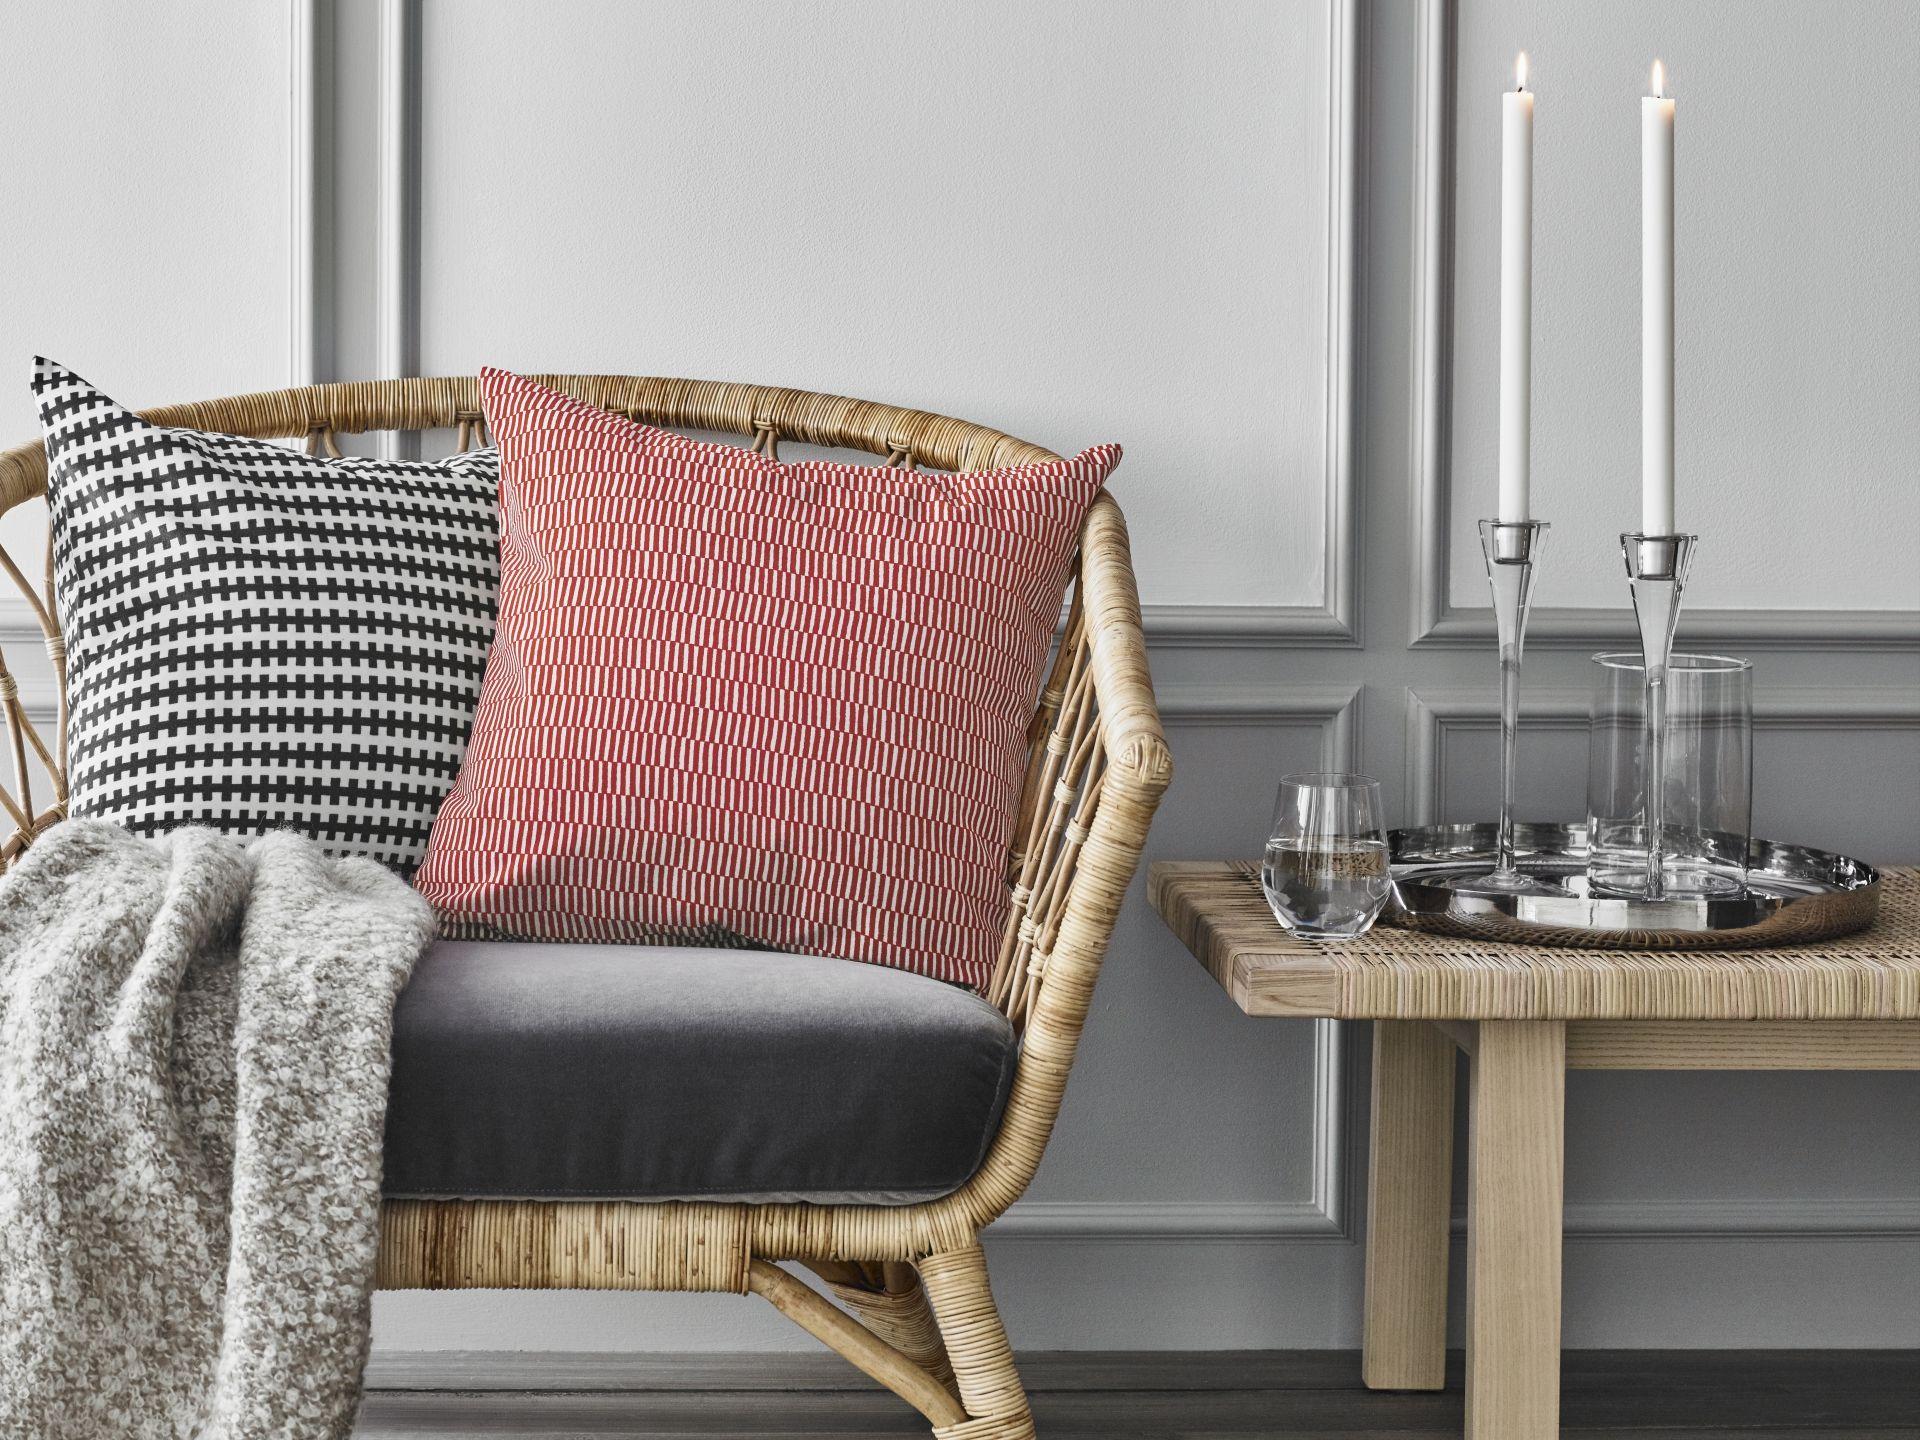 Rotan Stoel Ikea : Stockholm 2017 fauteuil ikea ikeanl ikeanederland inspiratie